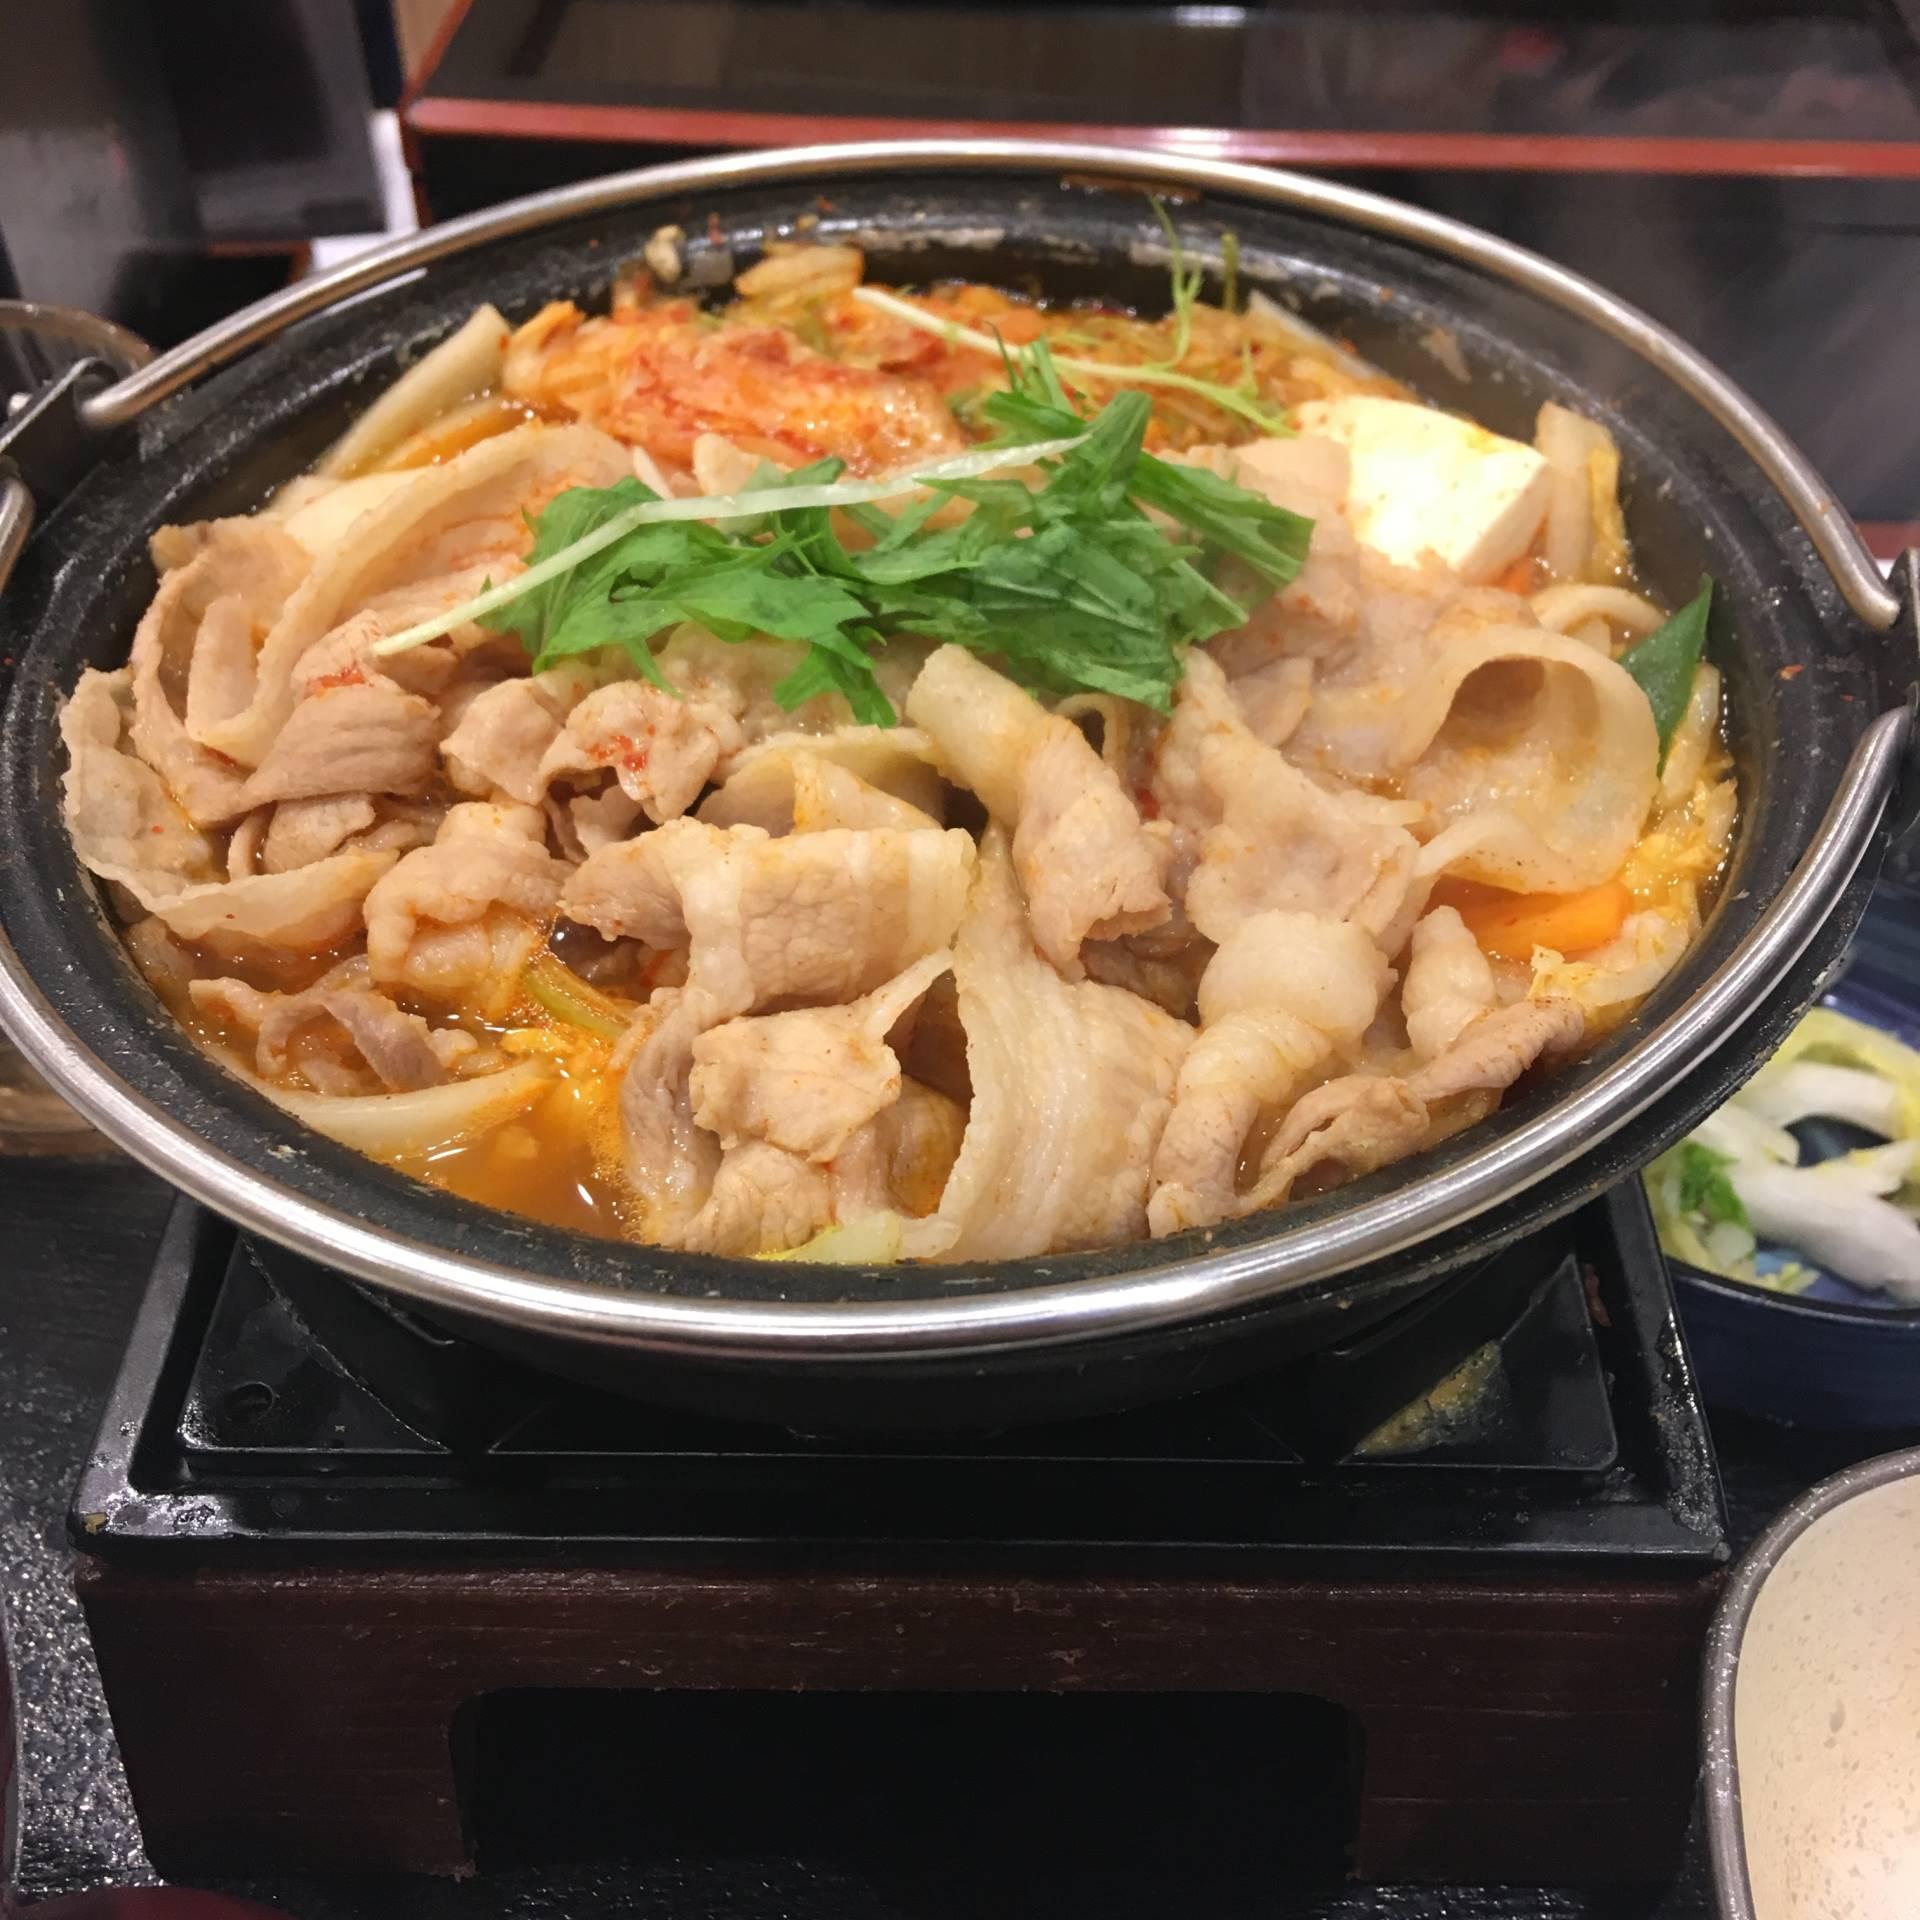 9食目 鬼辛豚チゲ鍋膳 セット並盛|吉野家